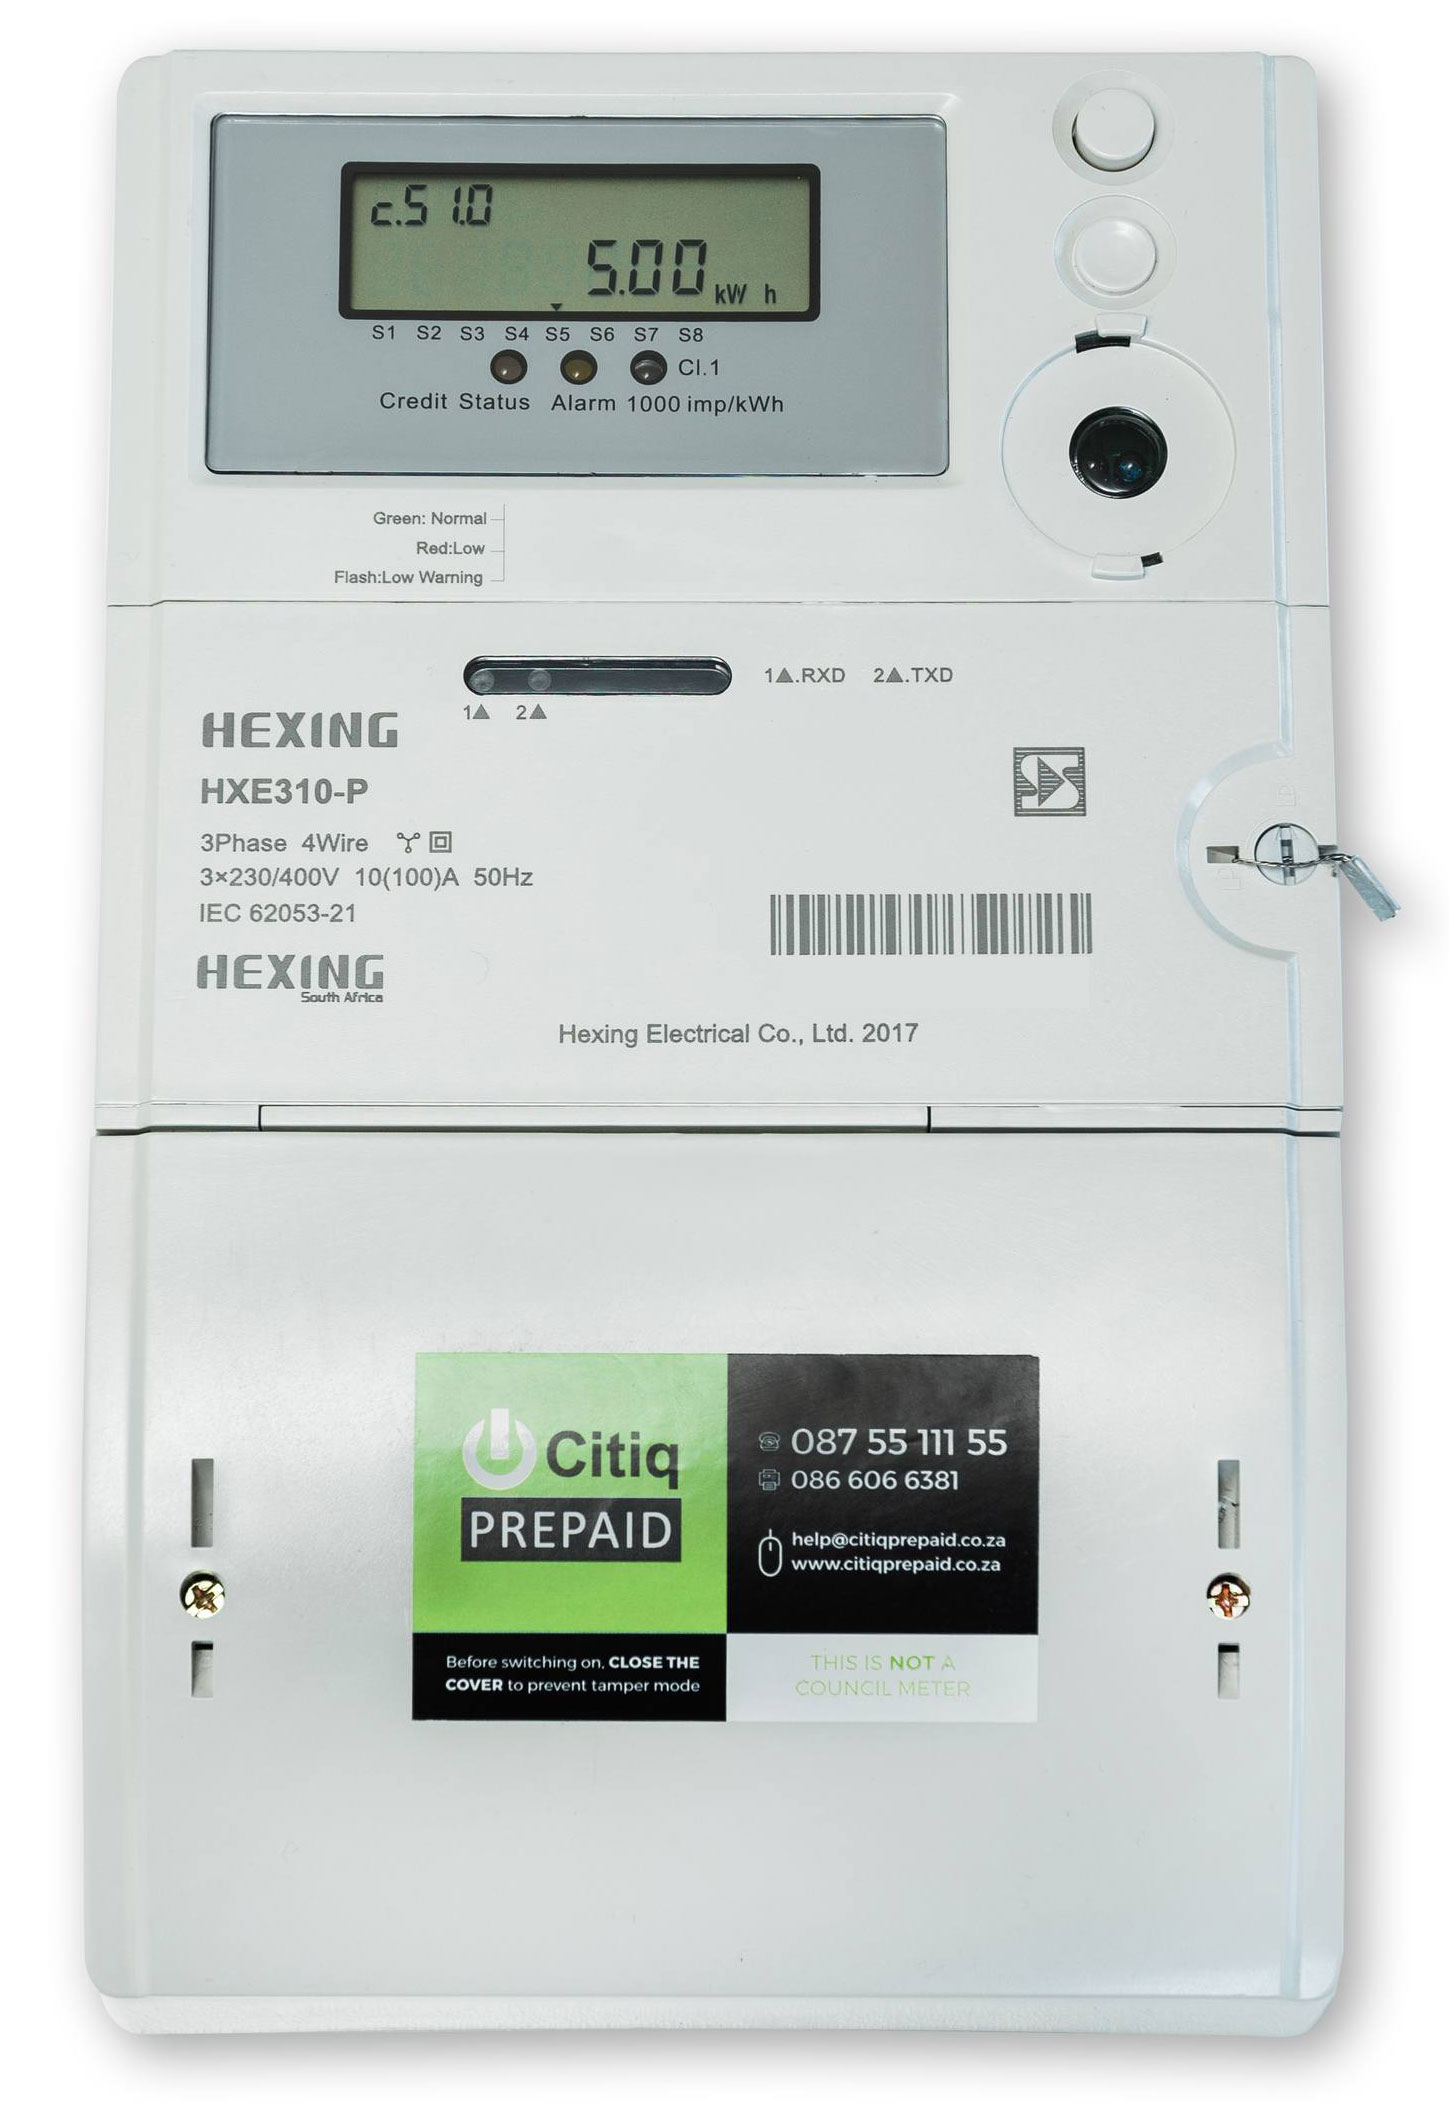 Hexing Three Phase Split Meter HXE 310 P 1 - Citiq Prepaid